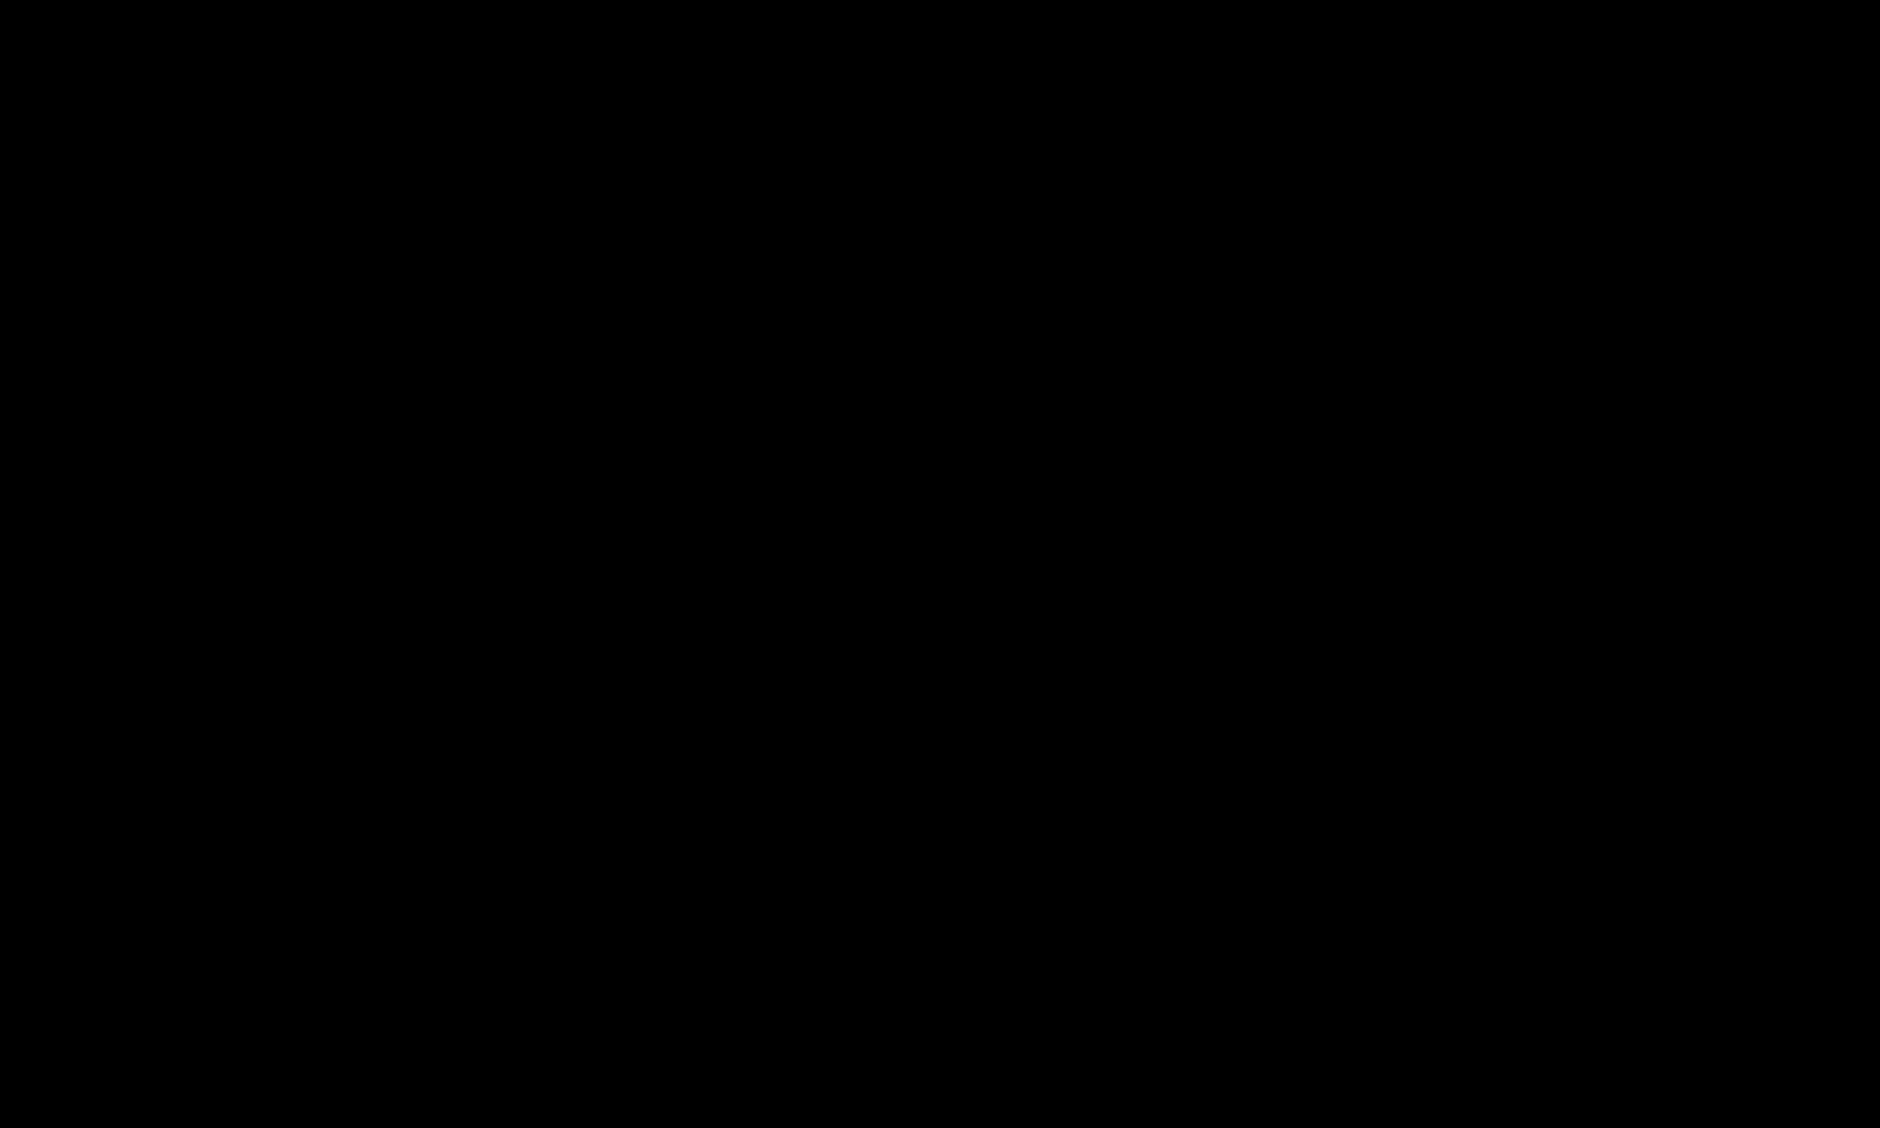 CONCOURS JUPE-CULOTTE 2016